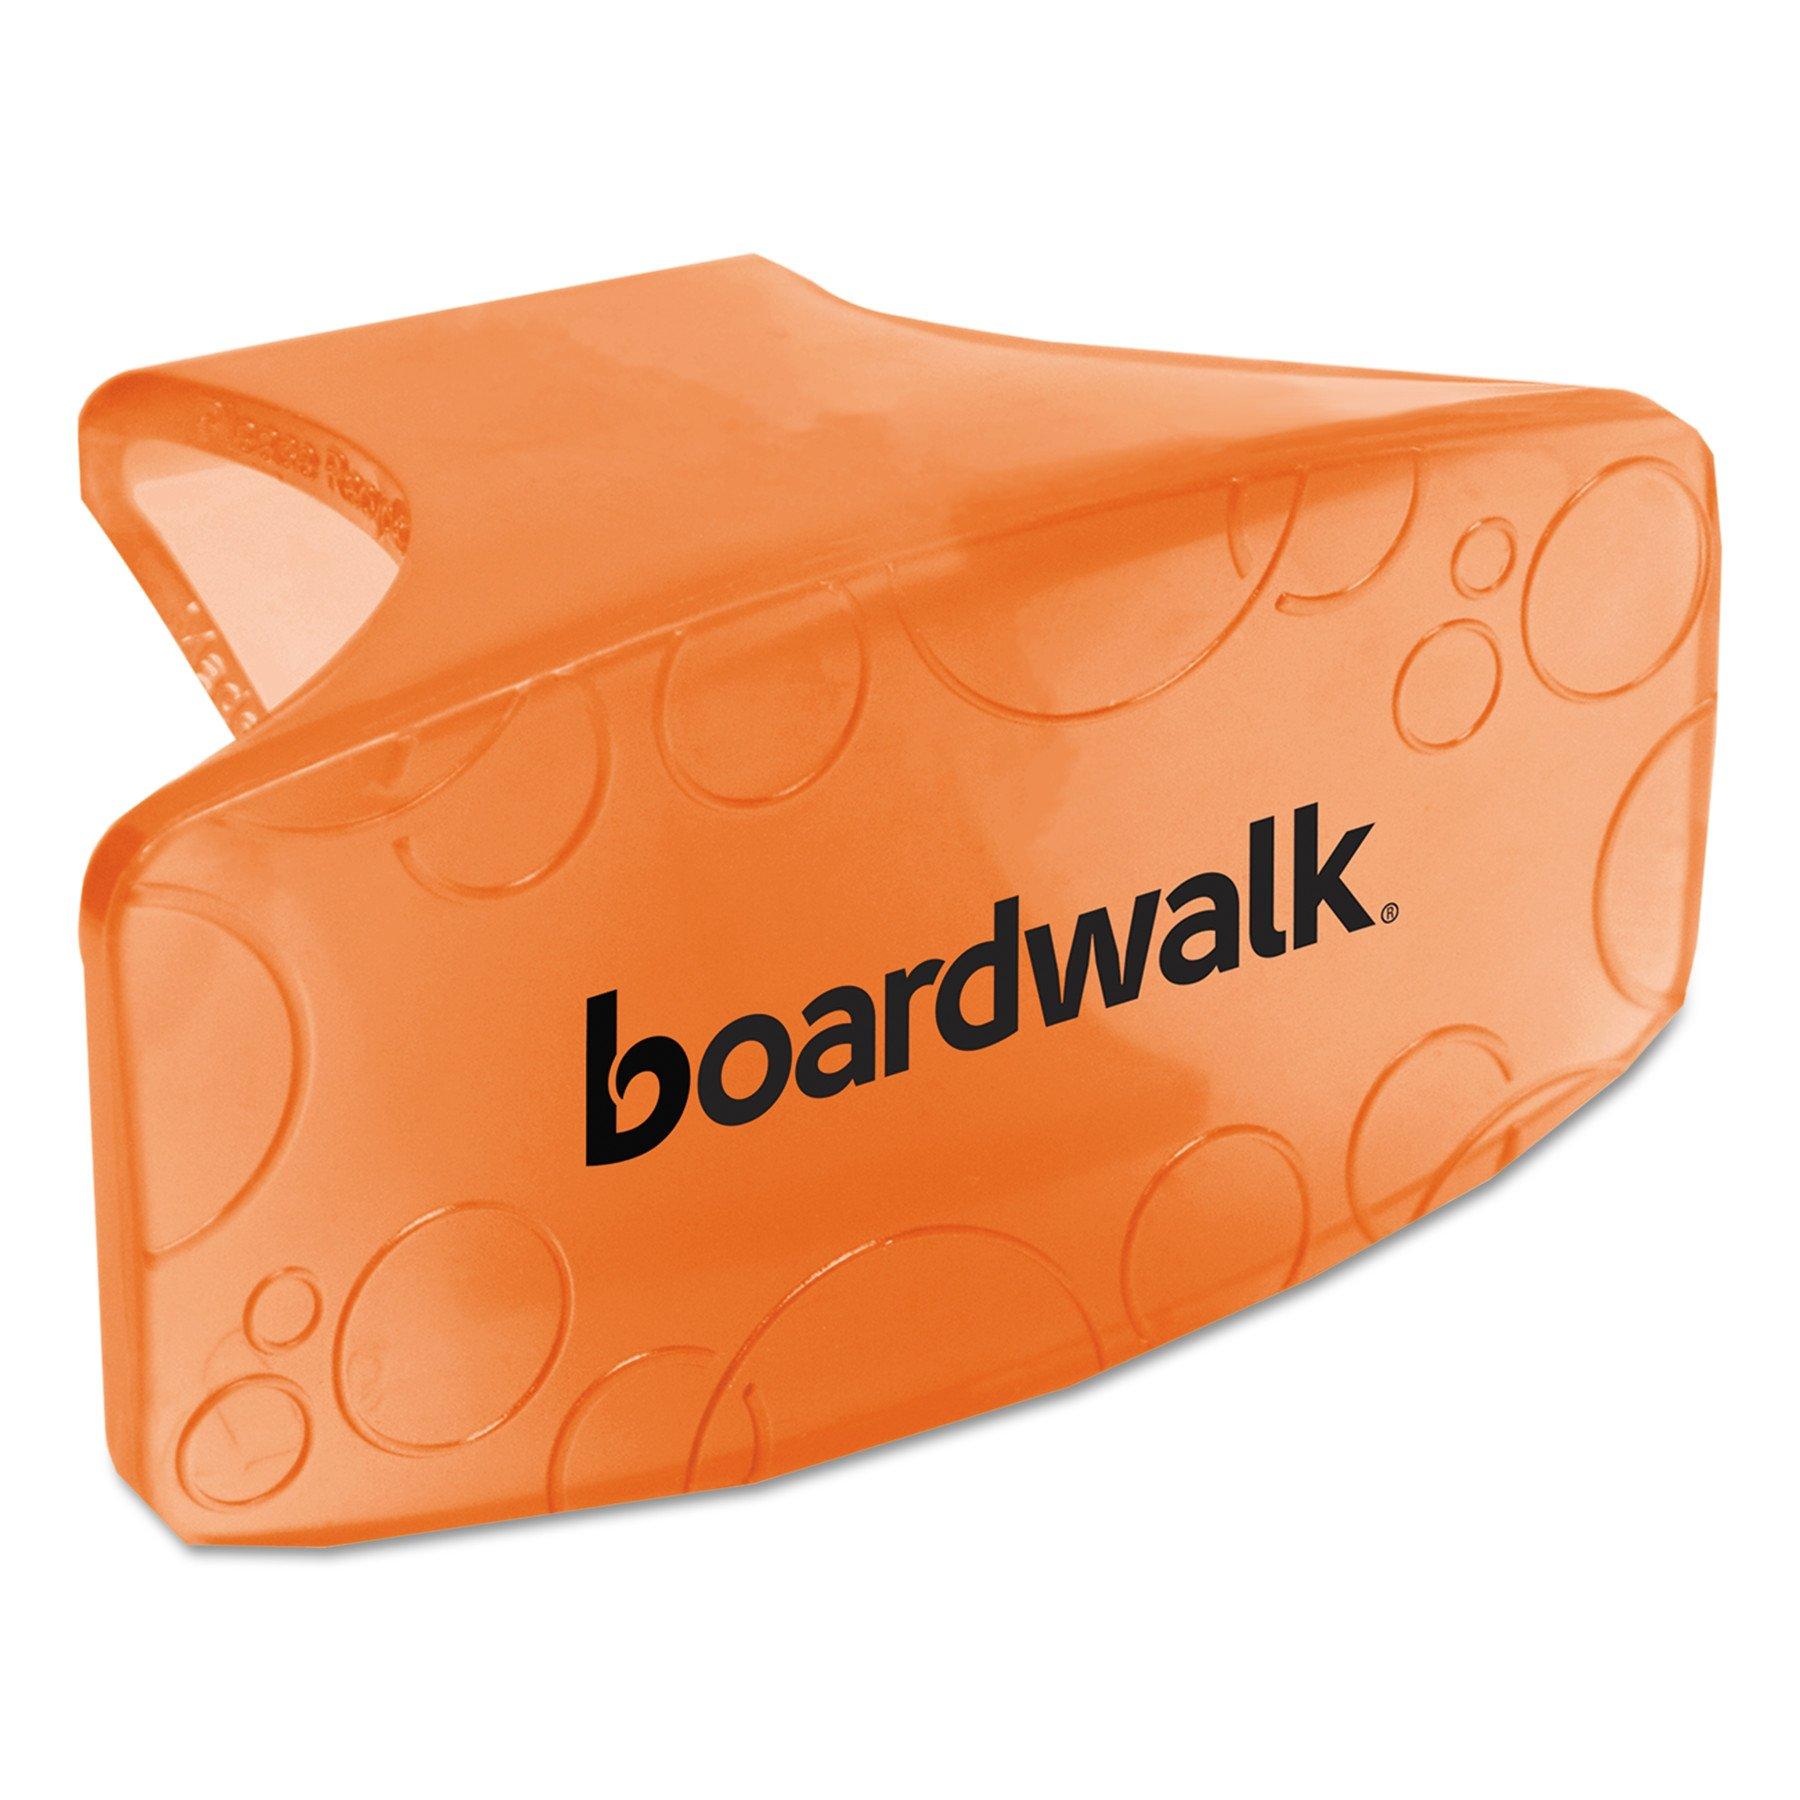 Boardwalk CLIPMAN Bowl Clip, Mango Scent, Orange (Box of 12)